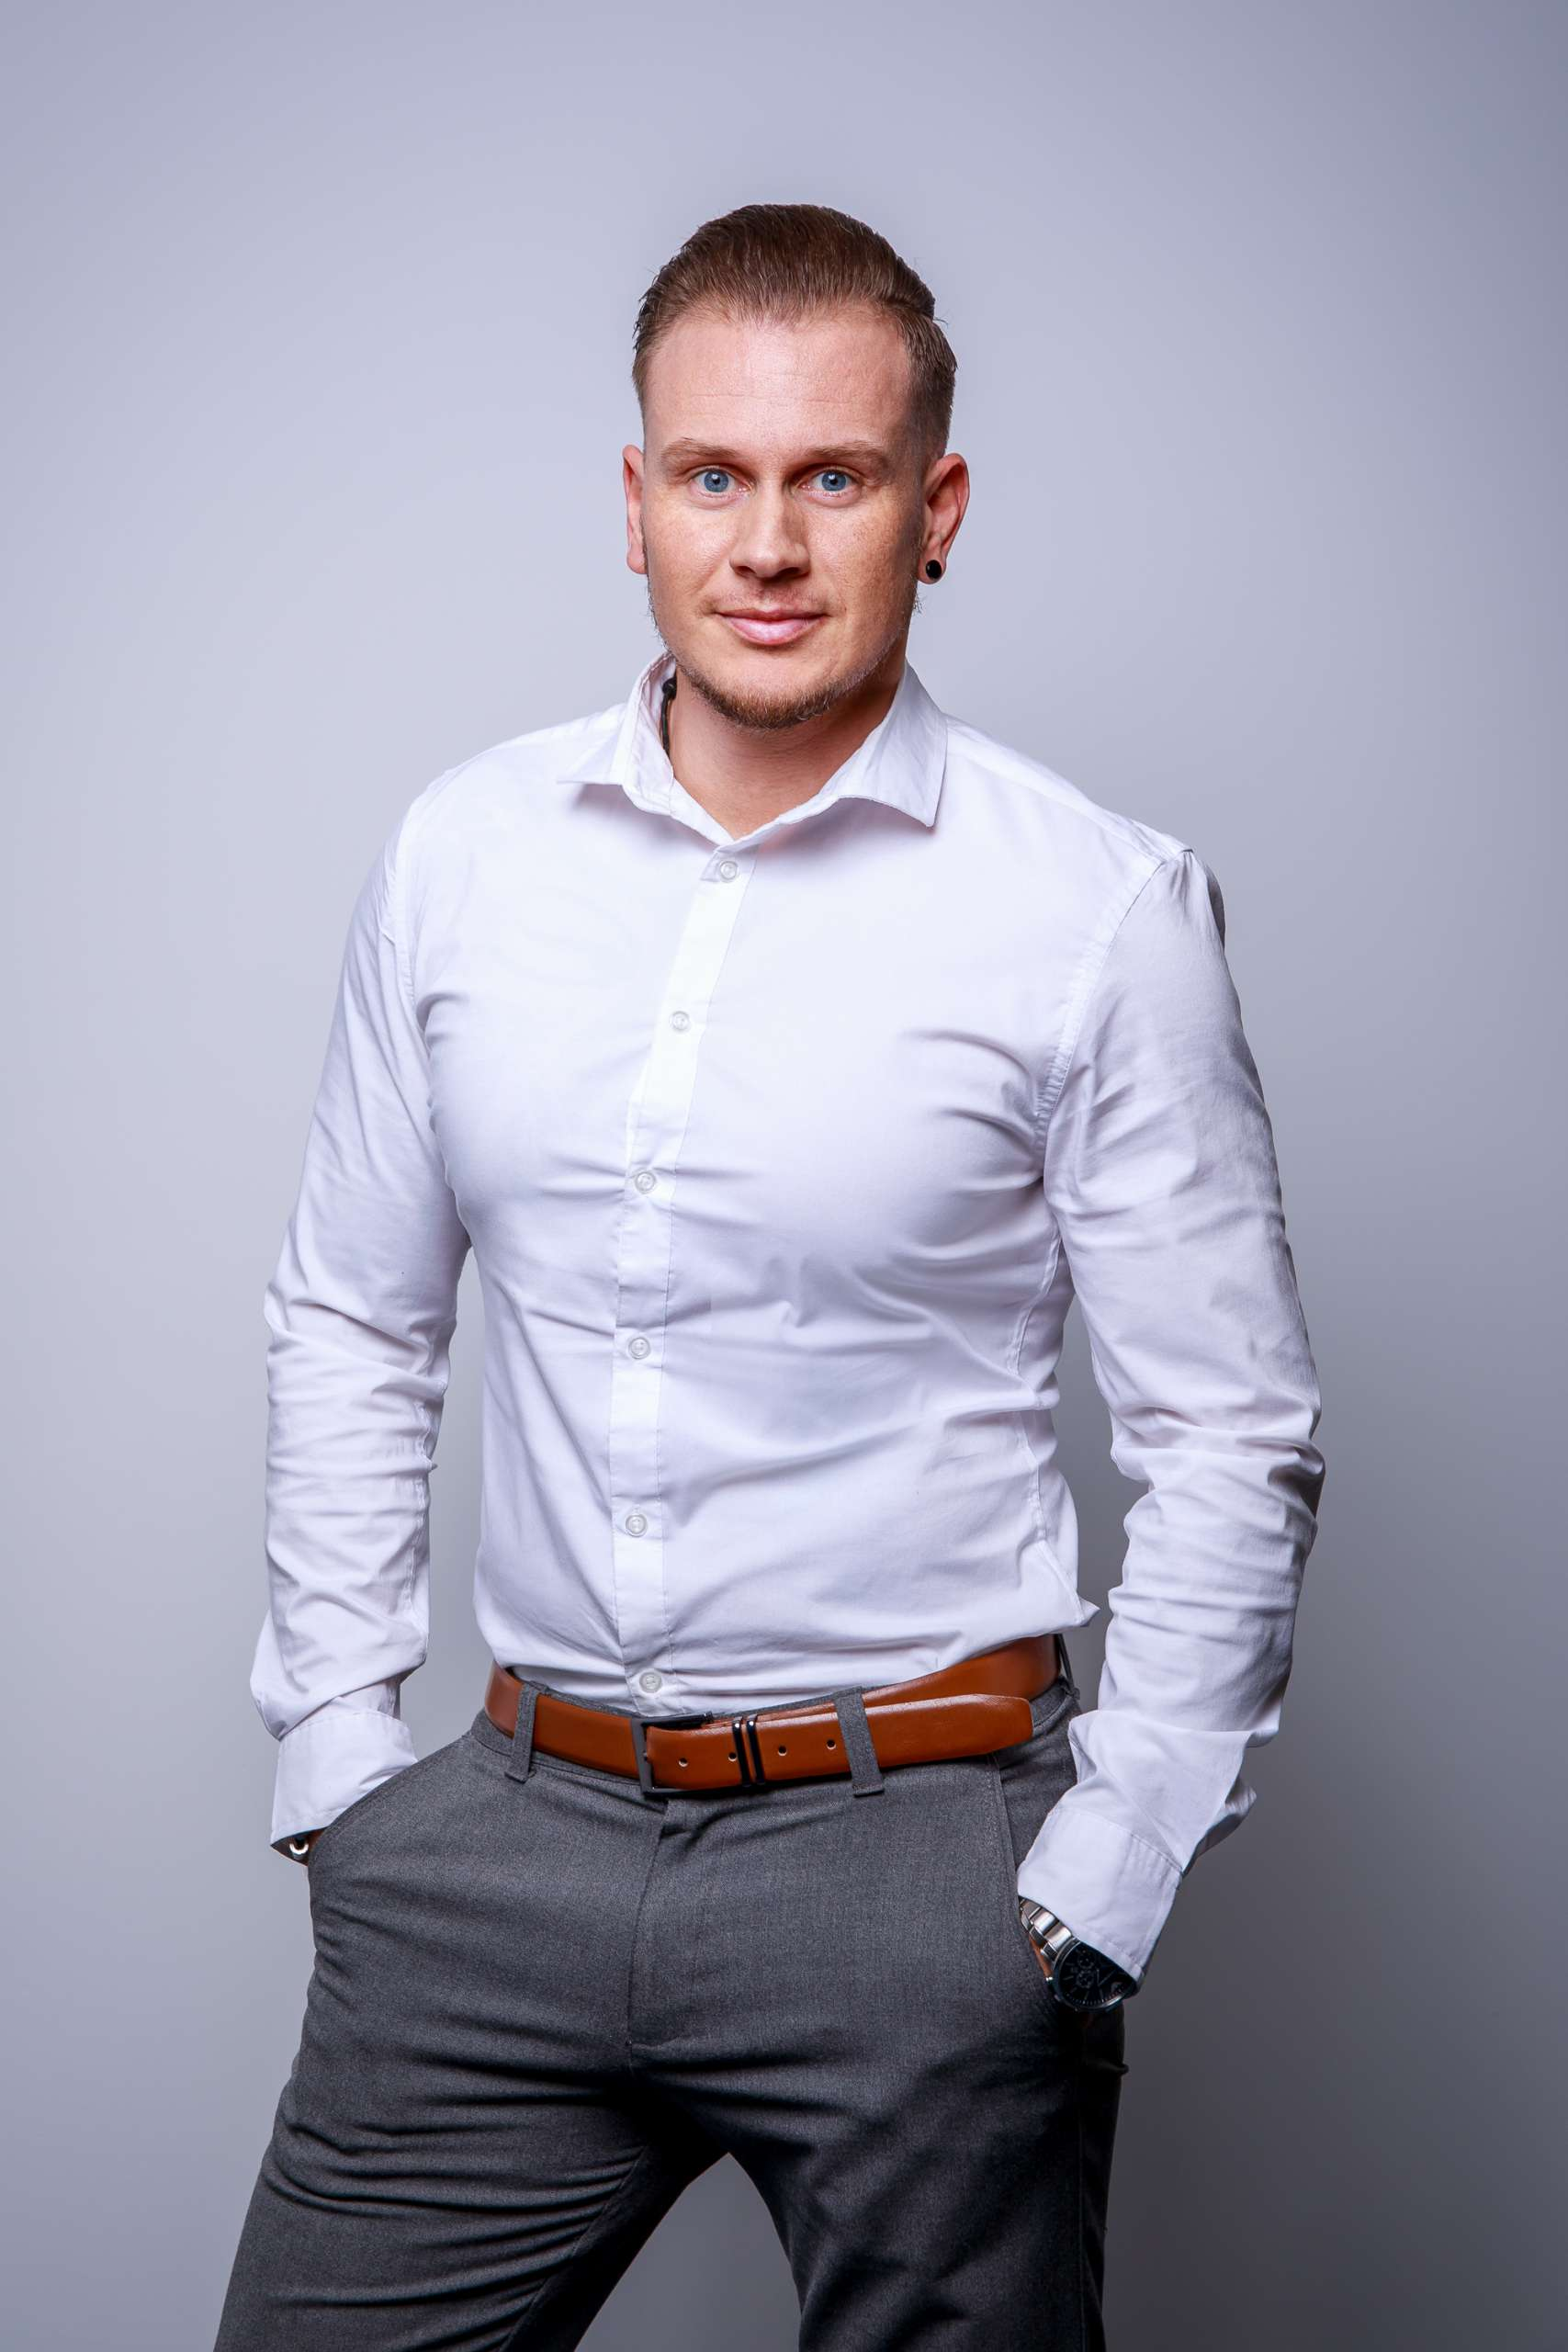 Jascha Santner